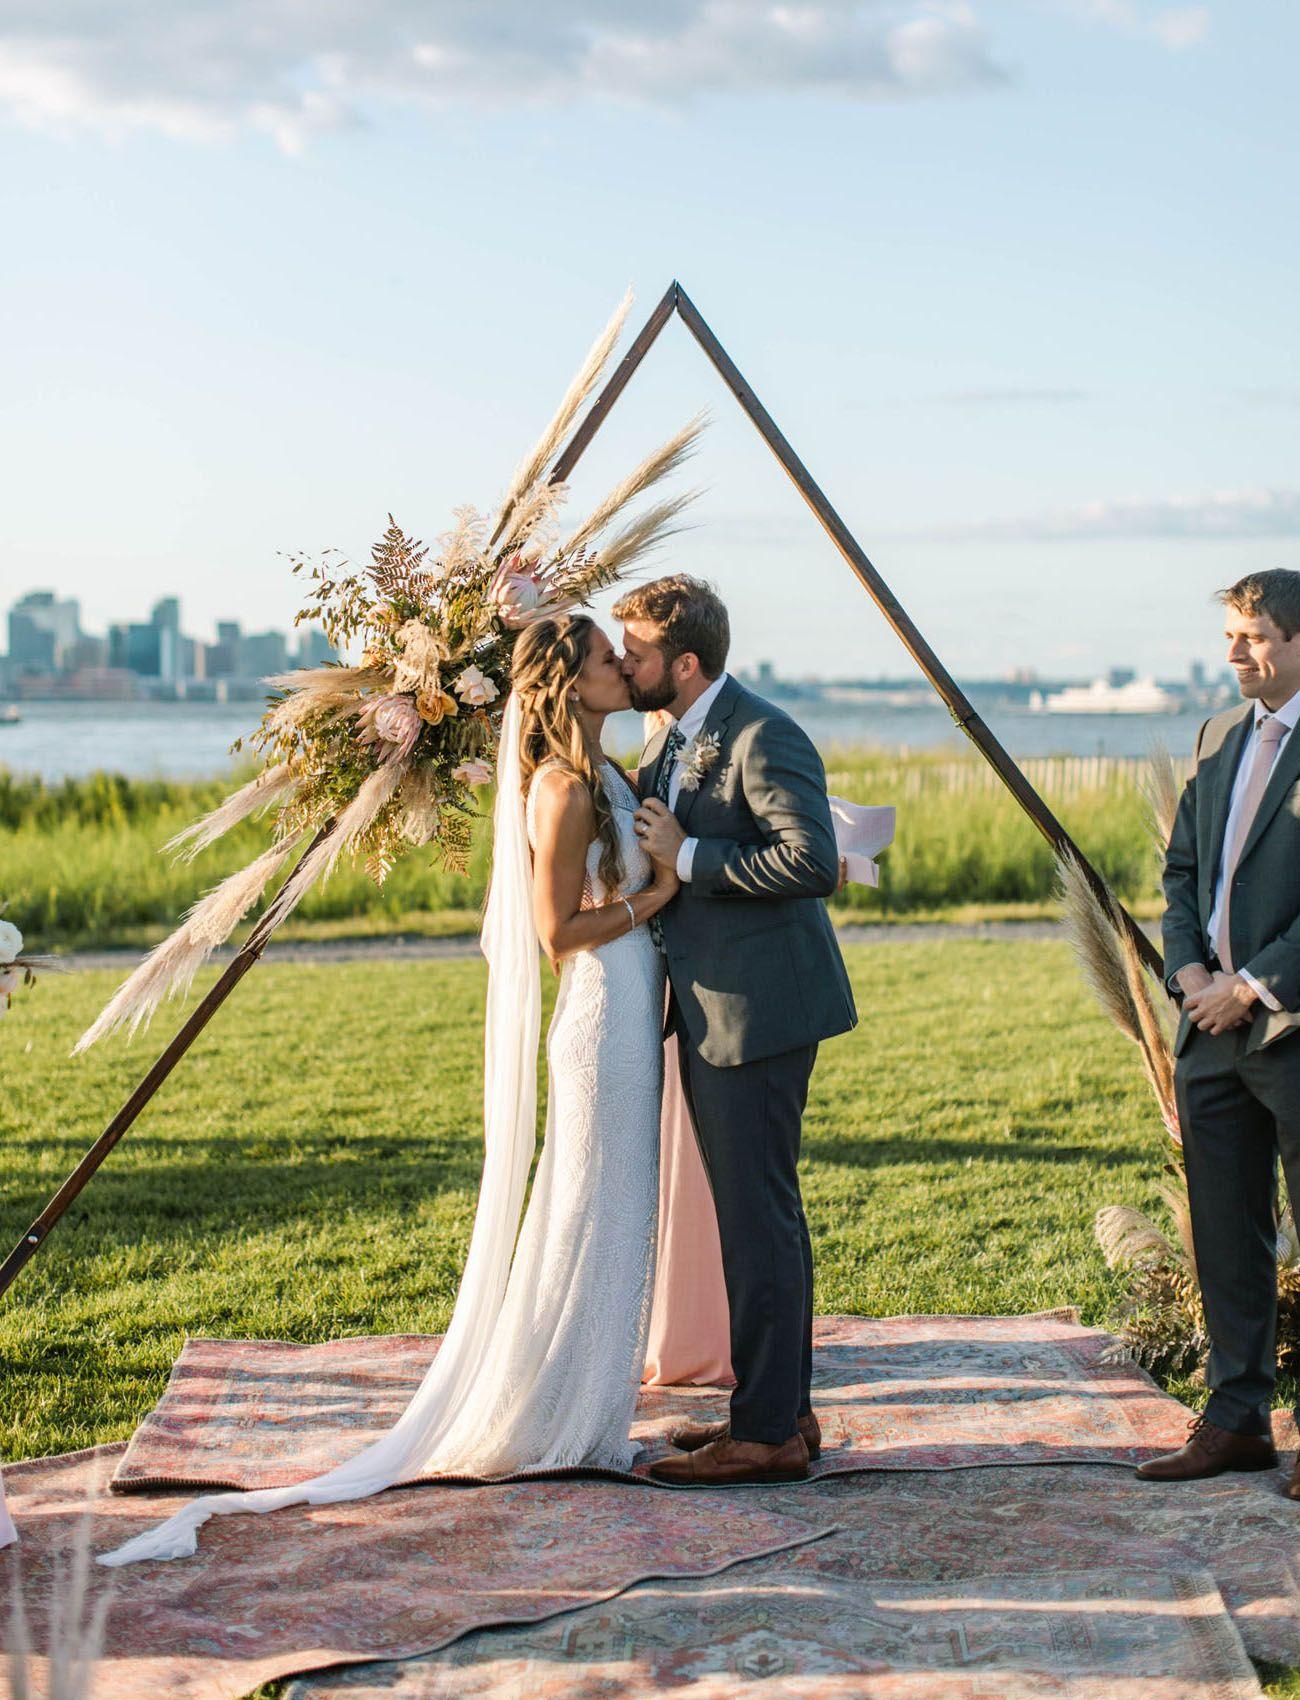 A Boho Glamping Wedding With Views Of The Manhattan Skyline